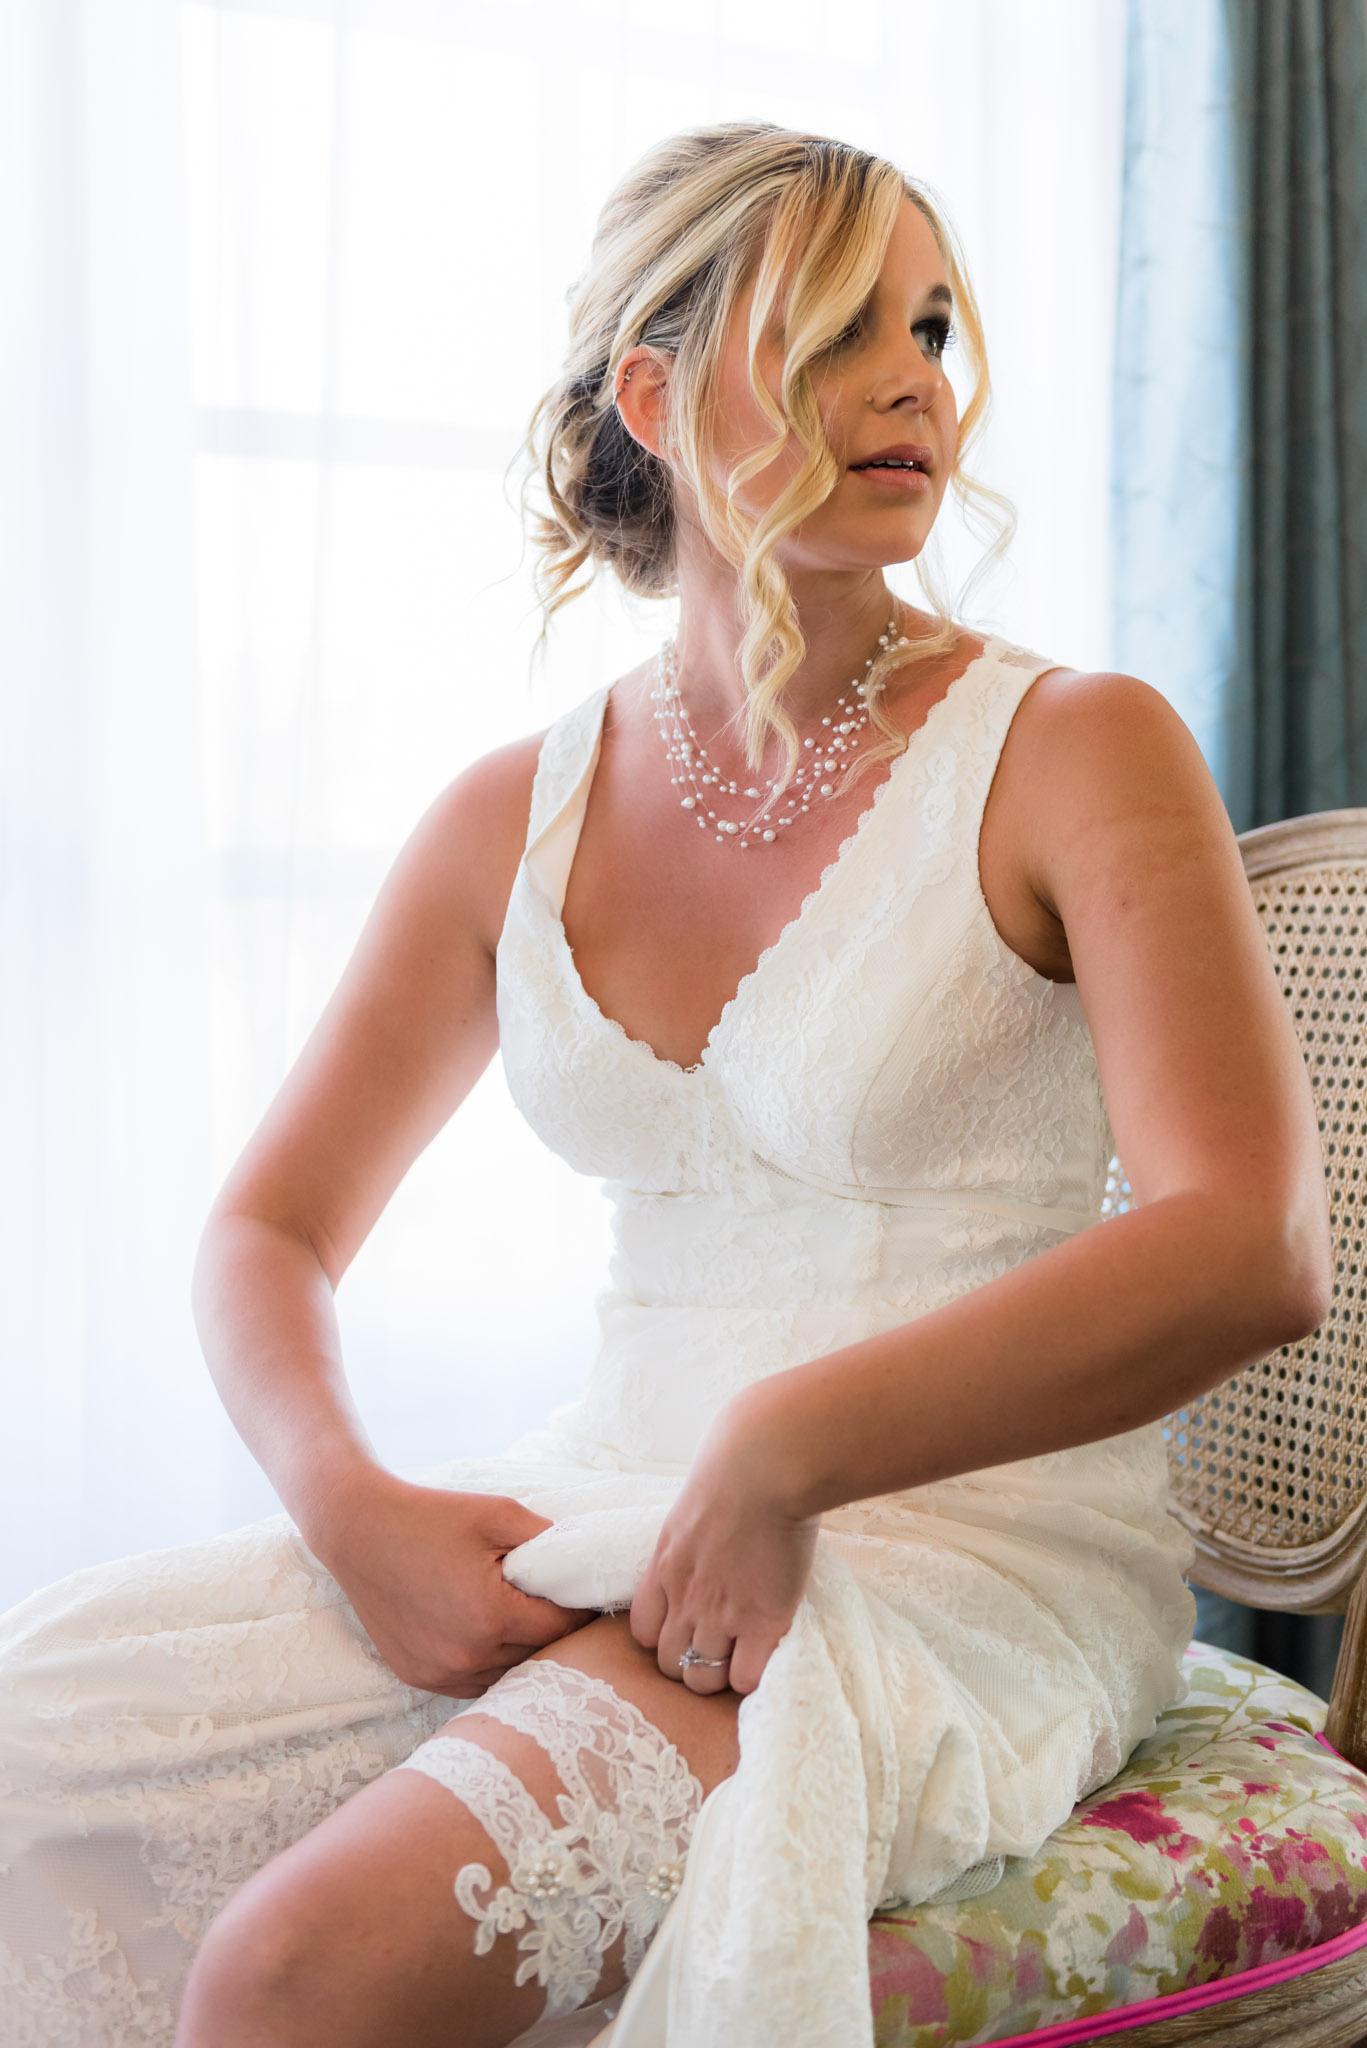 Avensole-Winery-Temecula-Wedding-Josh-and-Olivia-3131.JPG